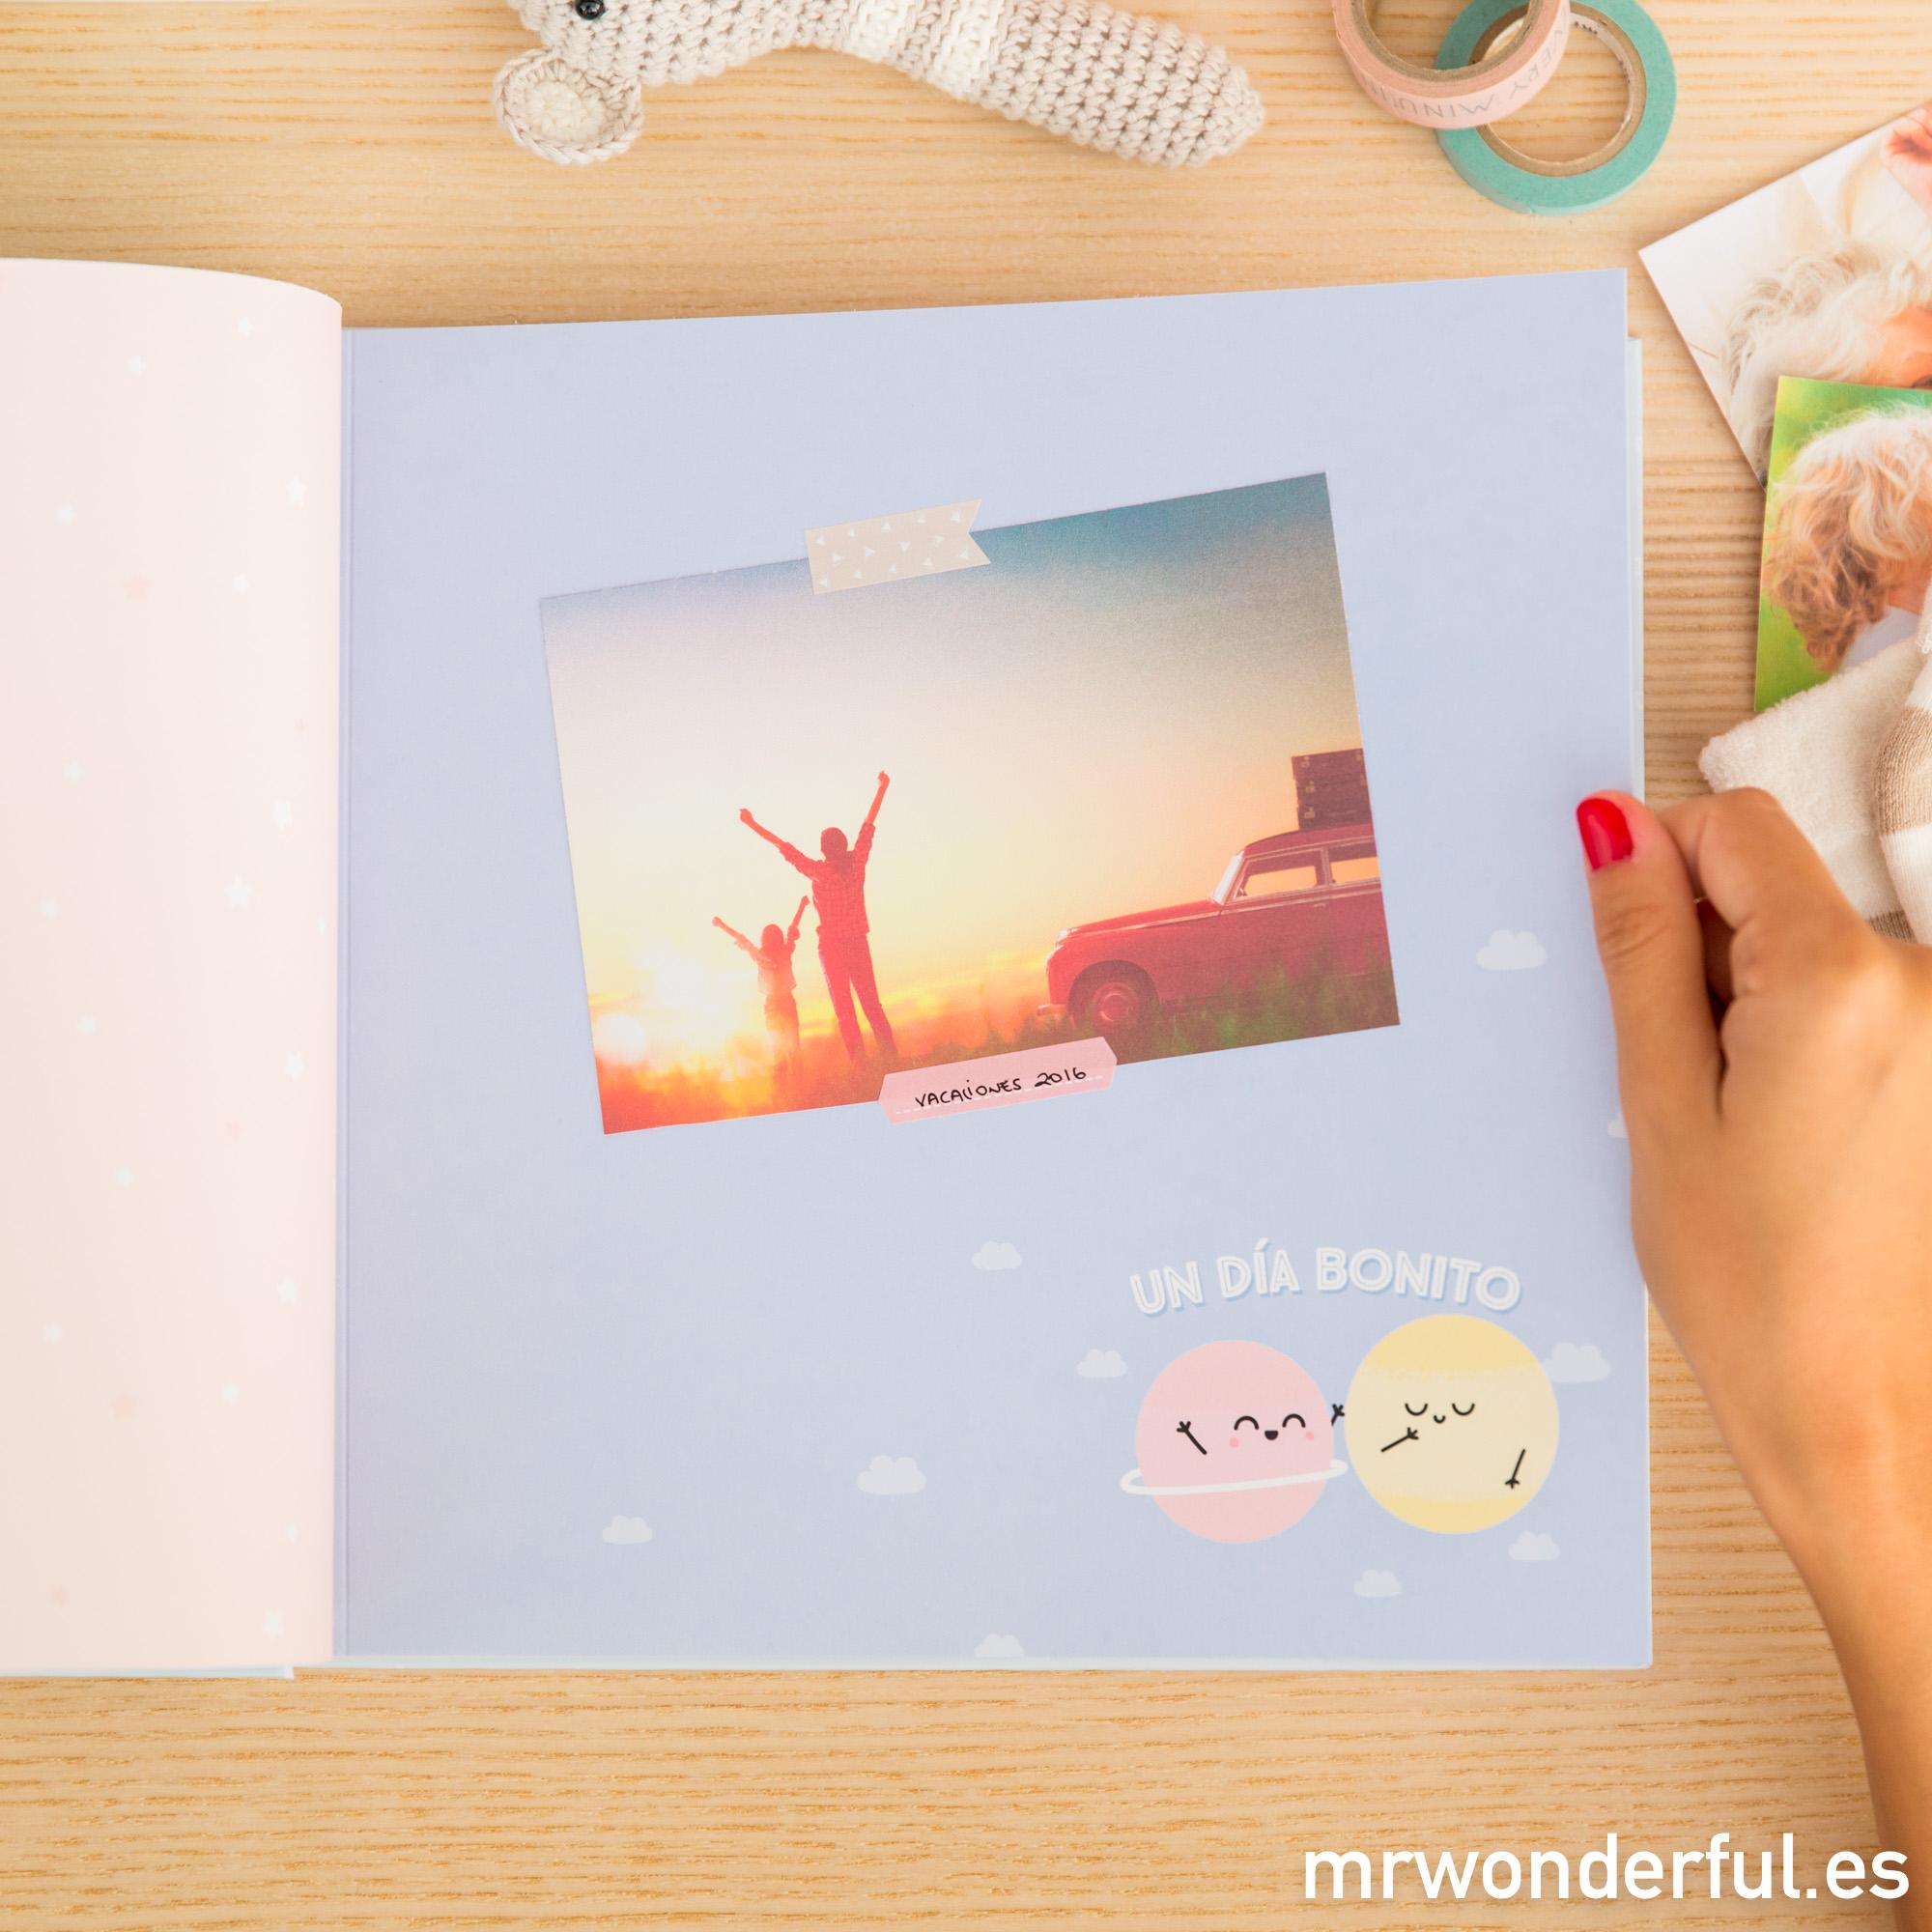 mrwonderful_8435460709828_album_infantil_Nuestros-recuerdos-ES-17